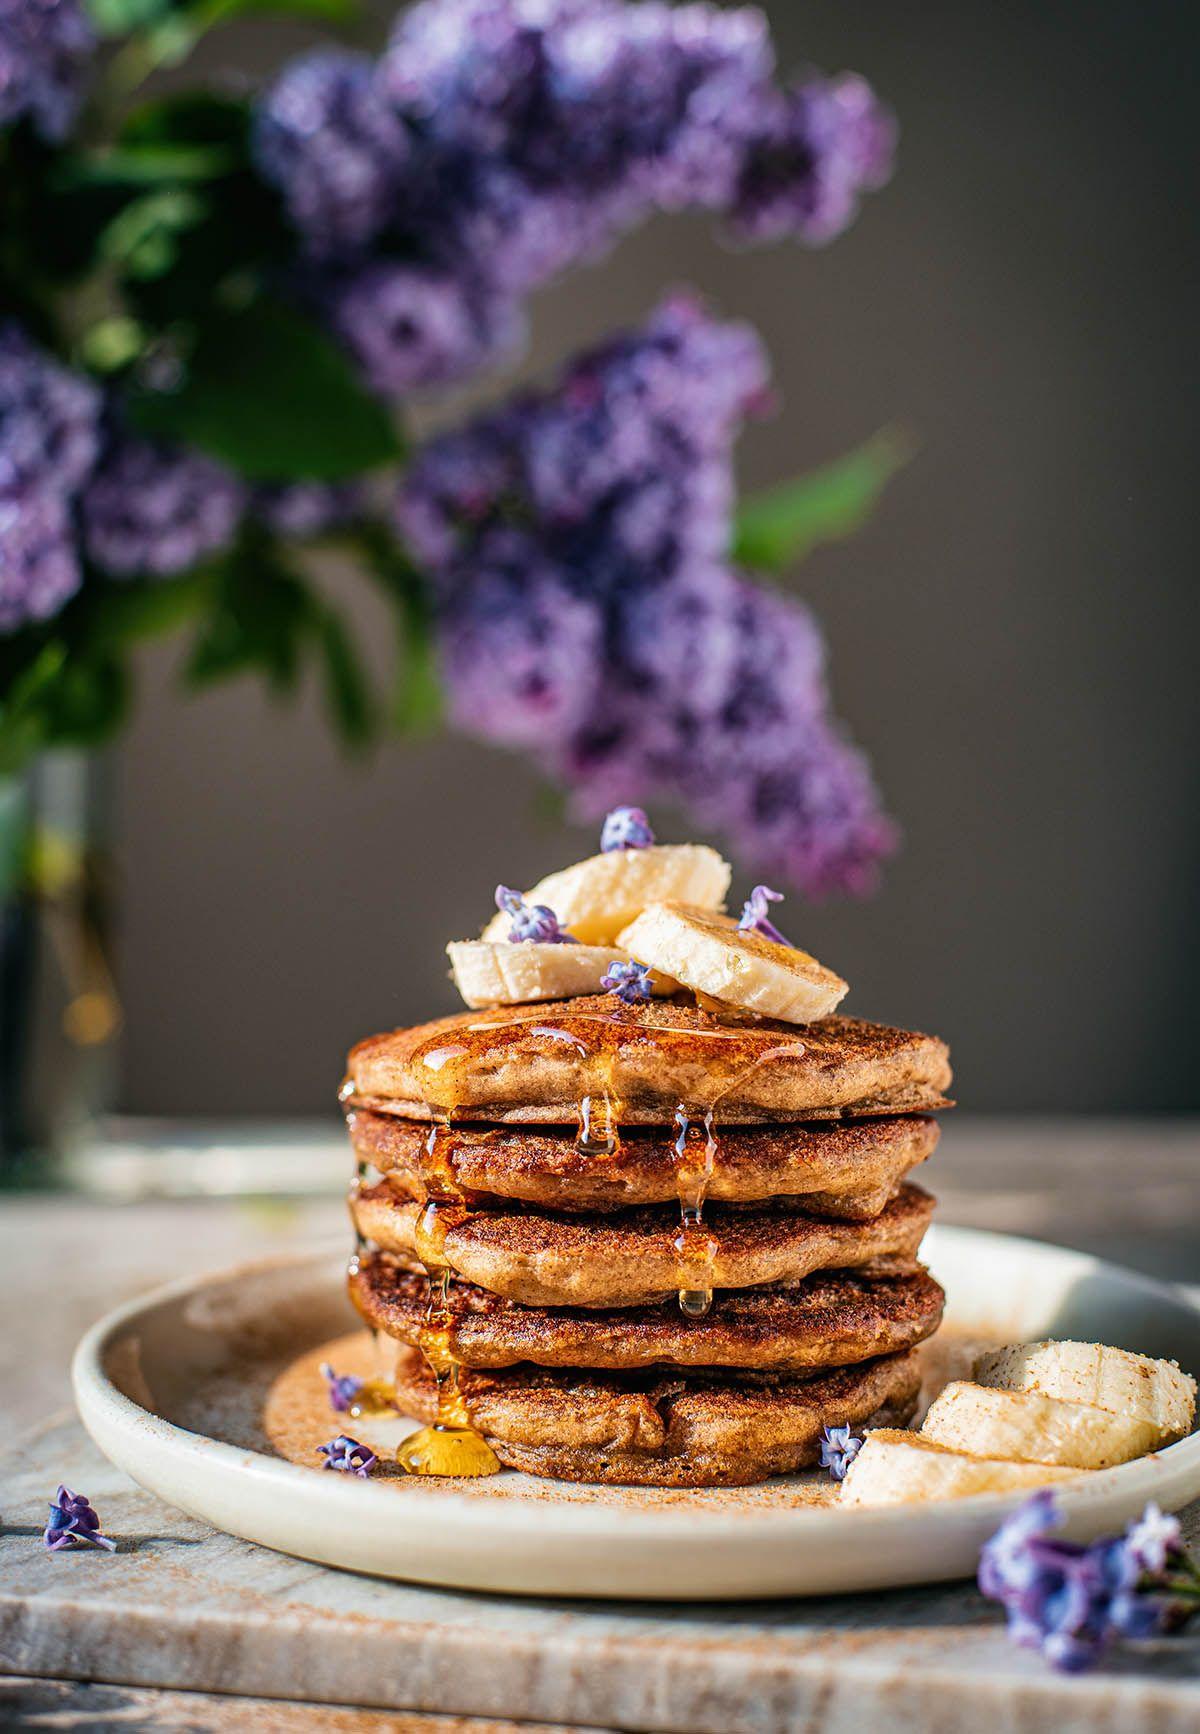 Fluffy gluten free banana pancakes with buckwheat flour